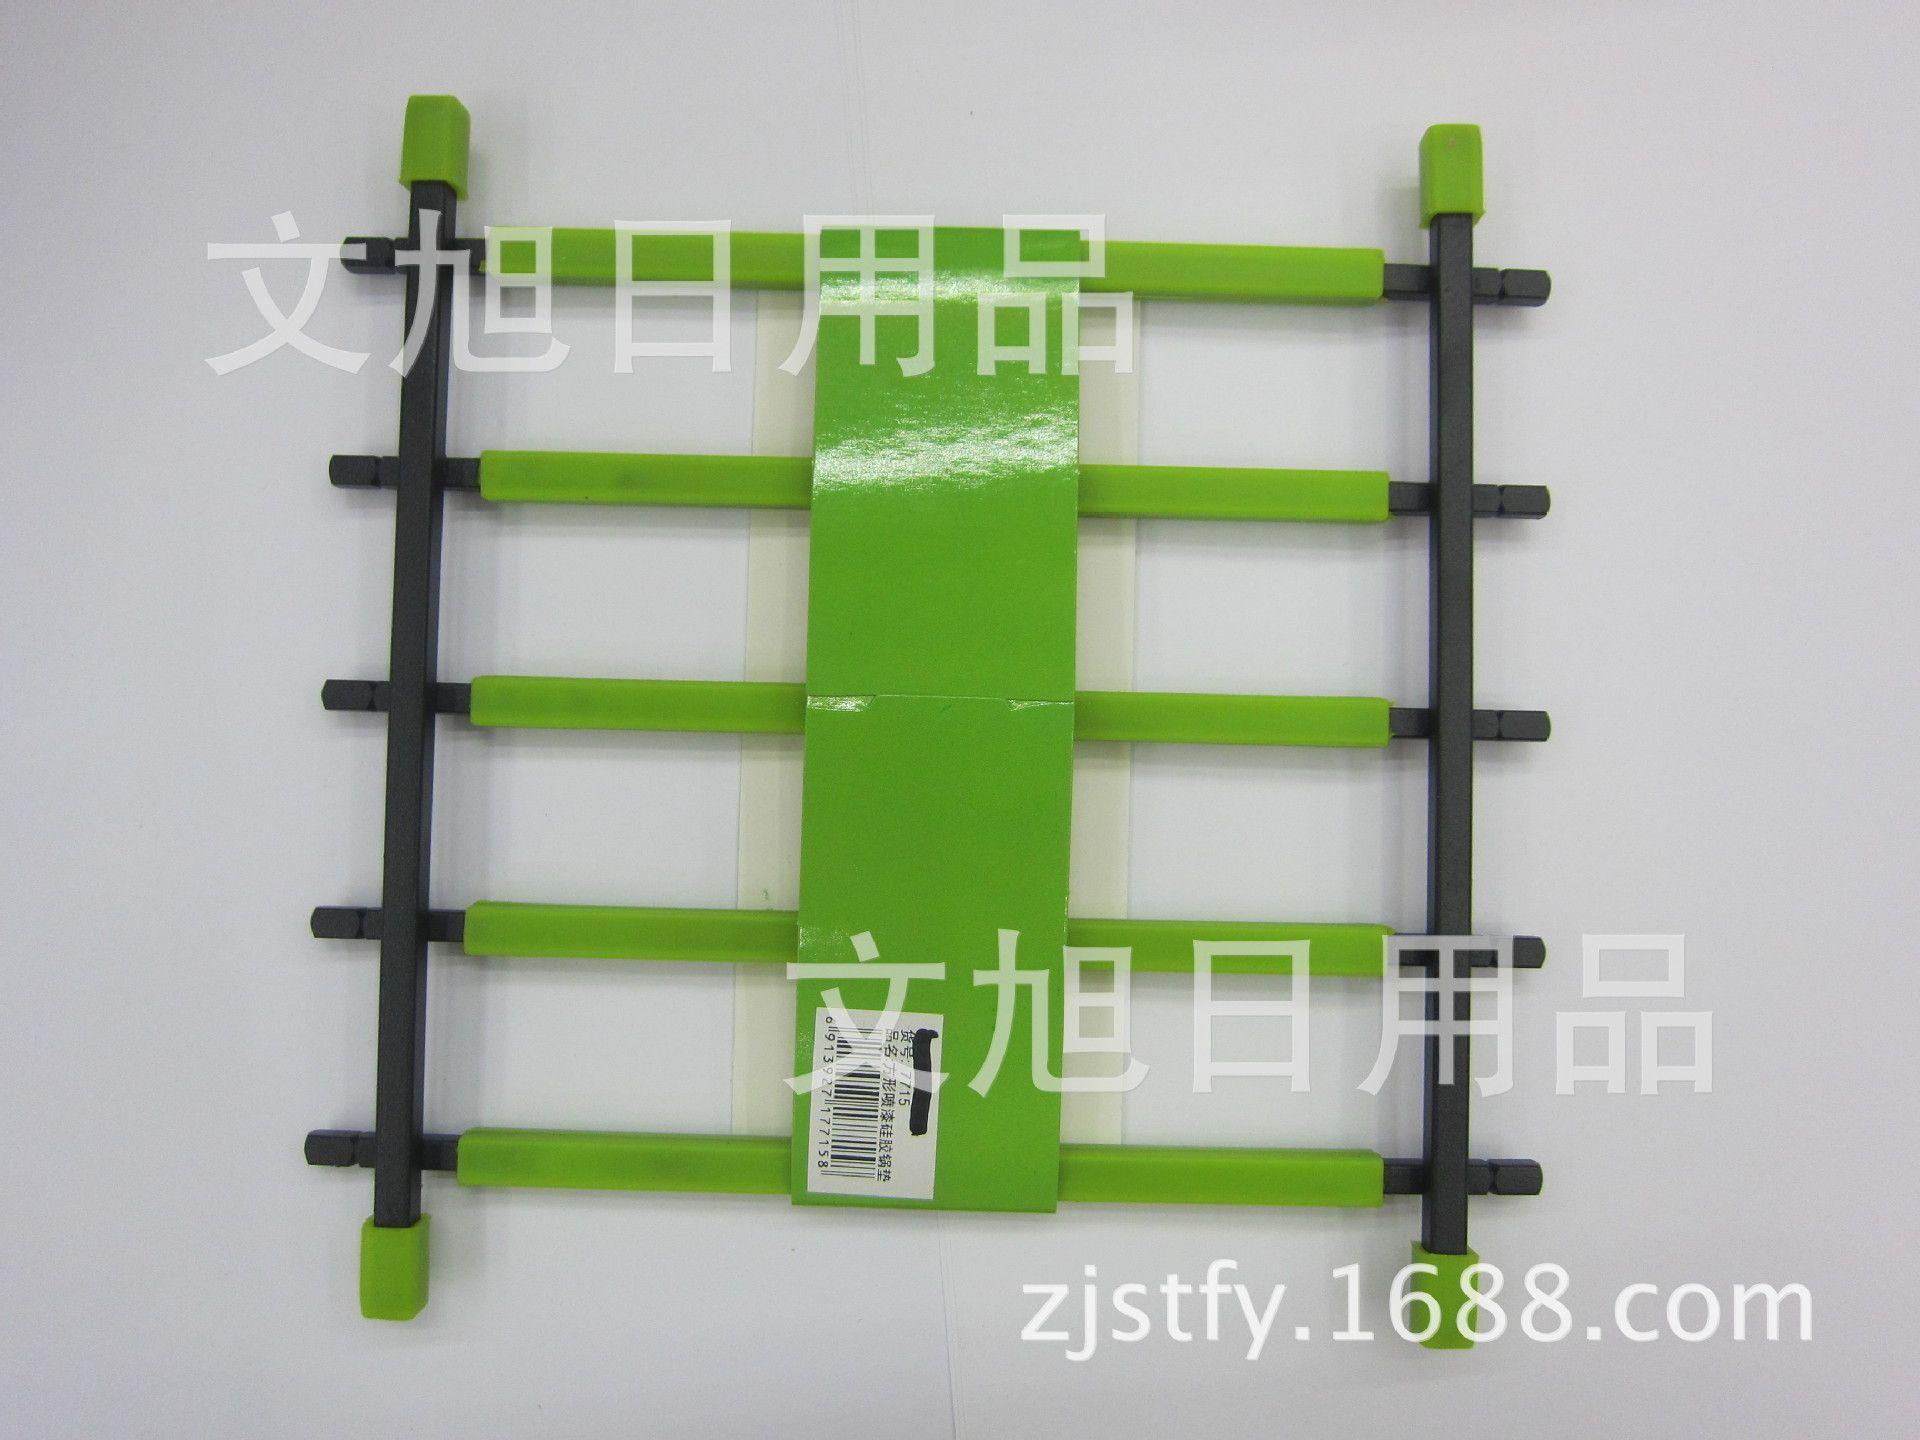 Heat Insulation Pad Originality European Non-slip Defence Hot Pot Pad Heat Insulation Frame Bowl Pad Silica Gel Heat Insulation Point